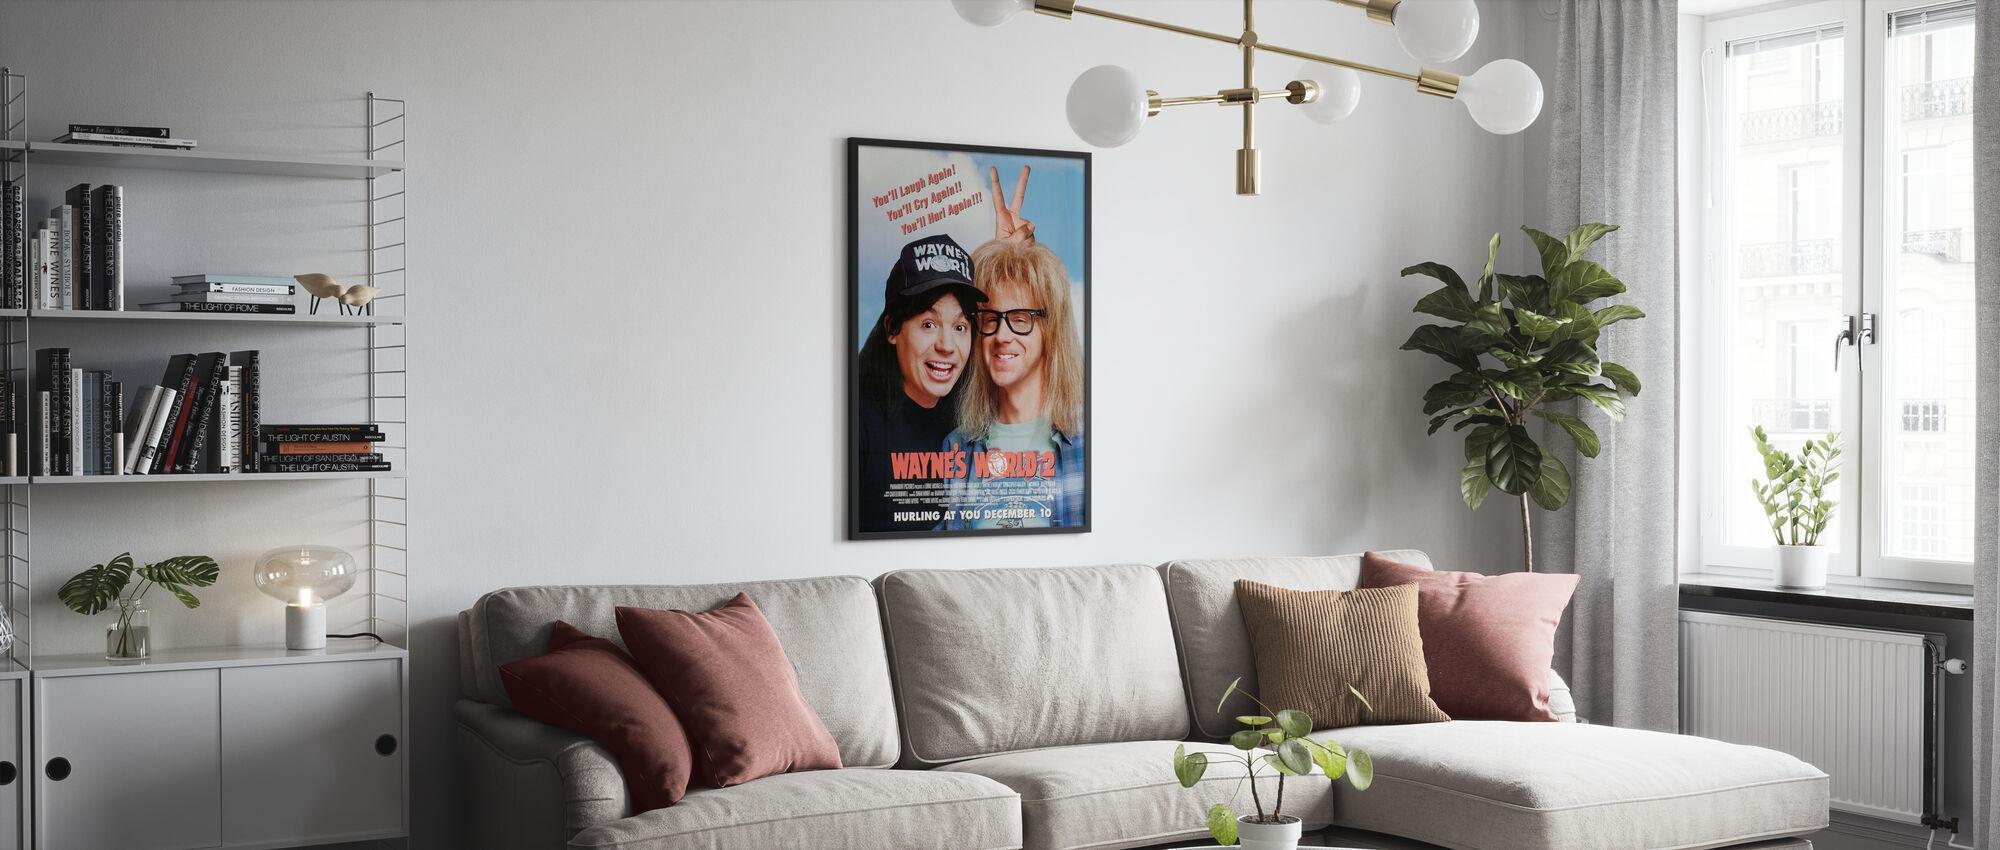 Waynes World 2 - Poster - Living Room